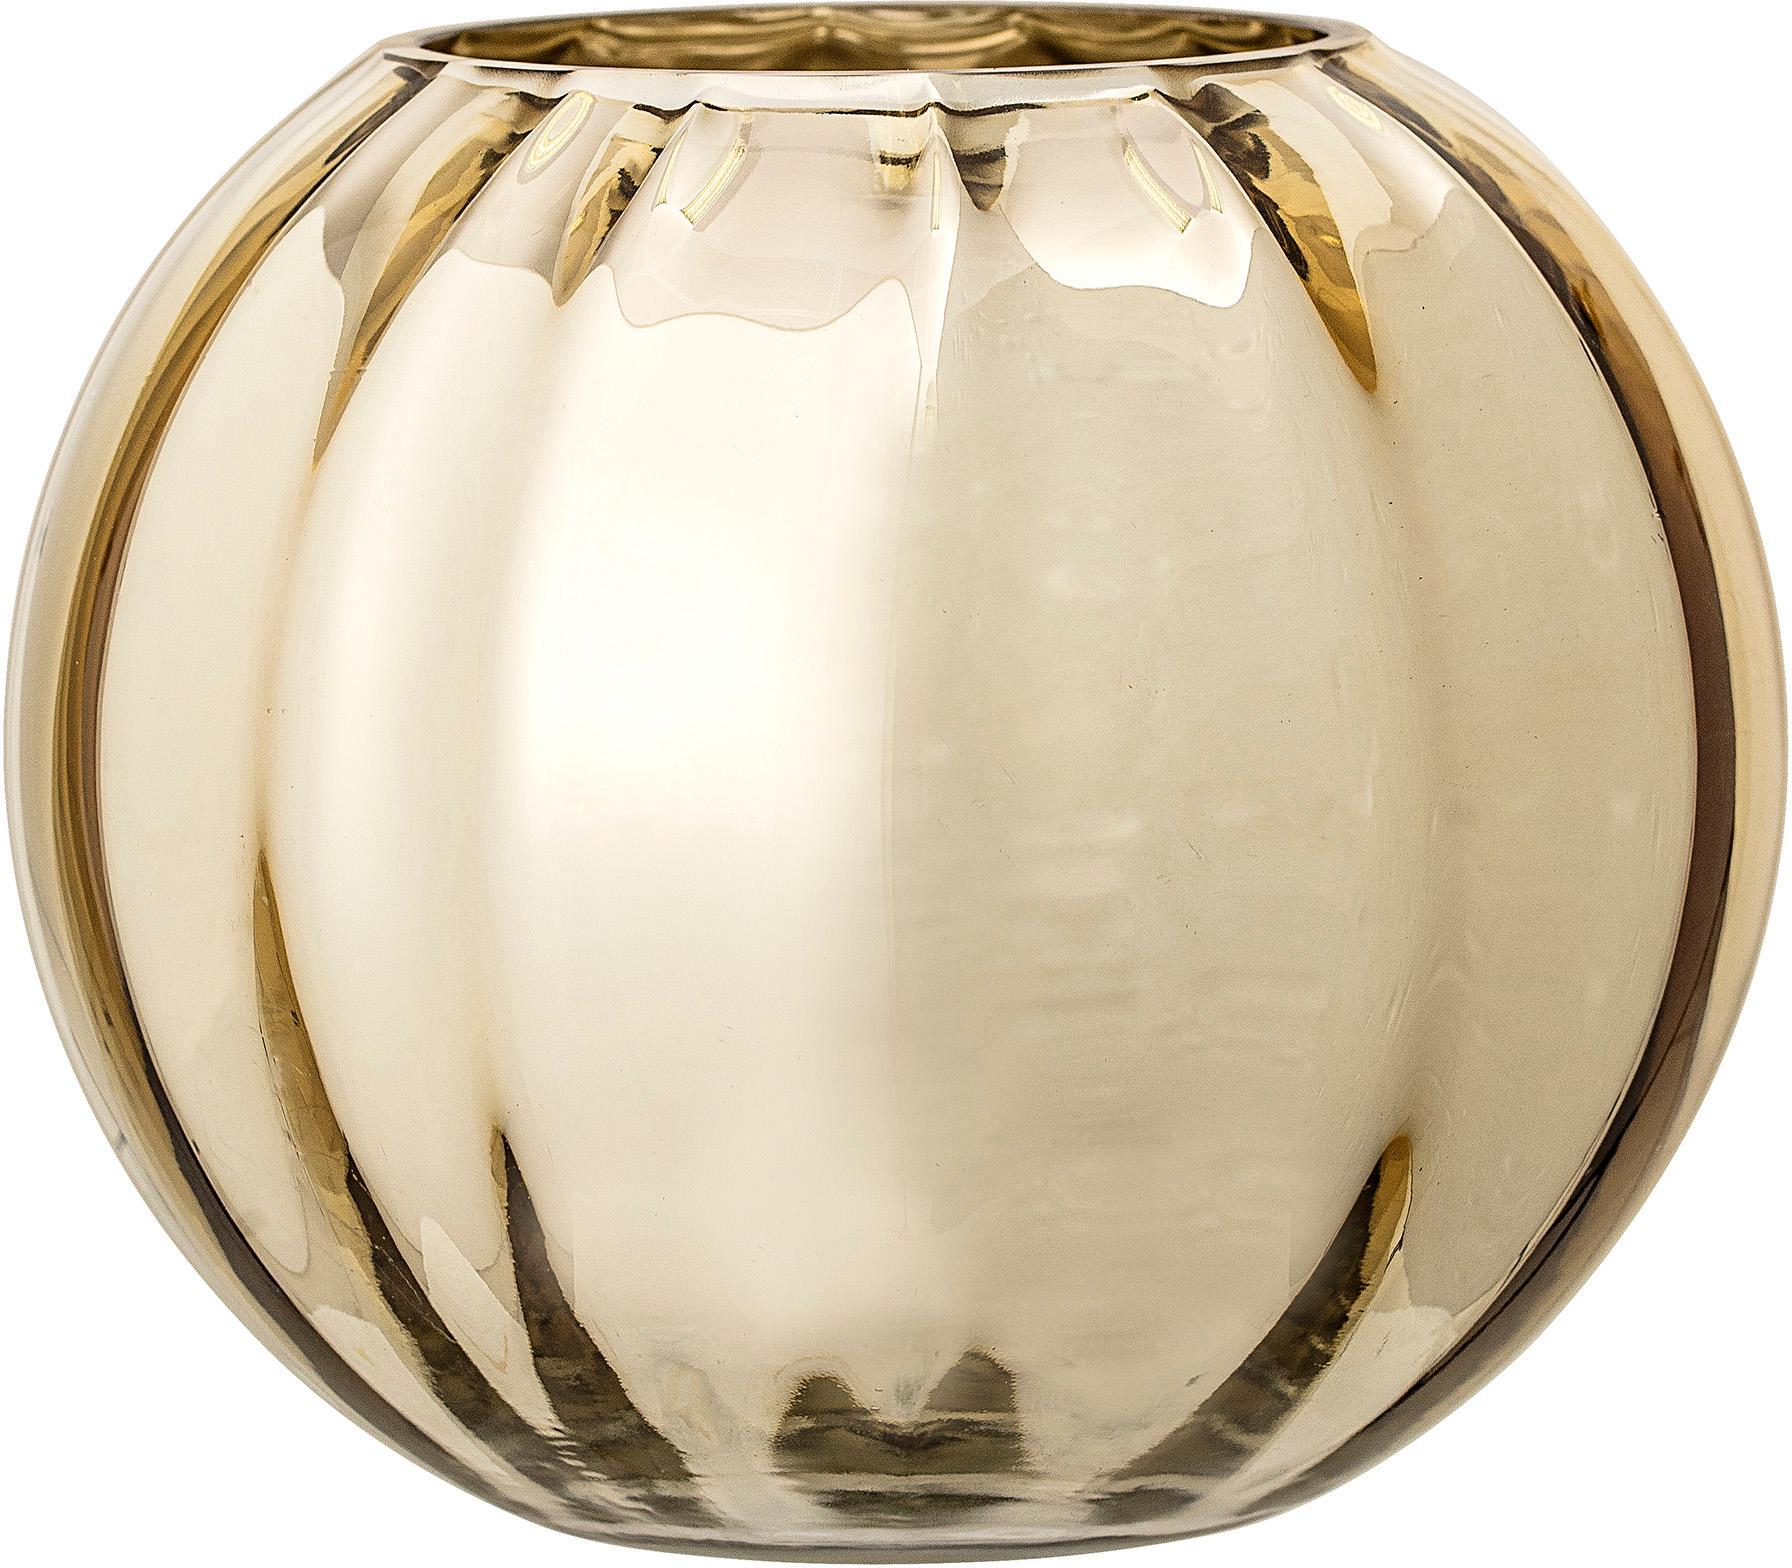 Jarrón de vidrio Viola, pequeño, Vidrio, Dorado, Ø 18 x Al 15 cm